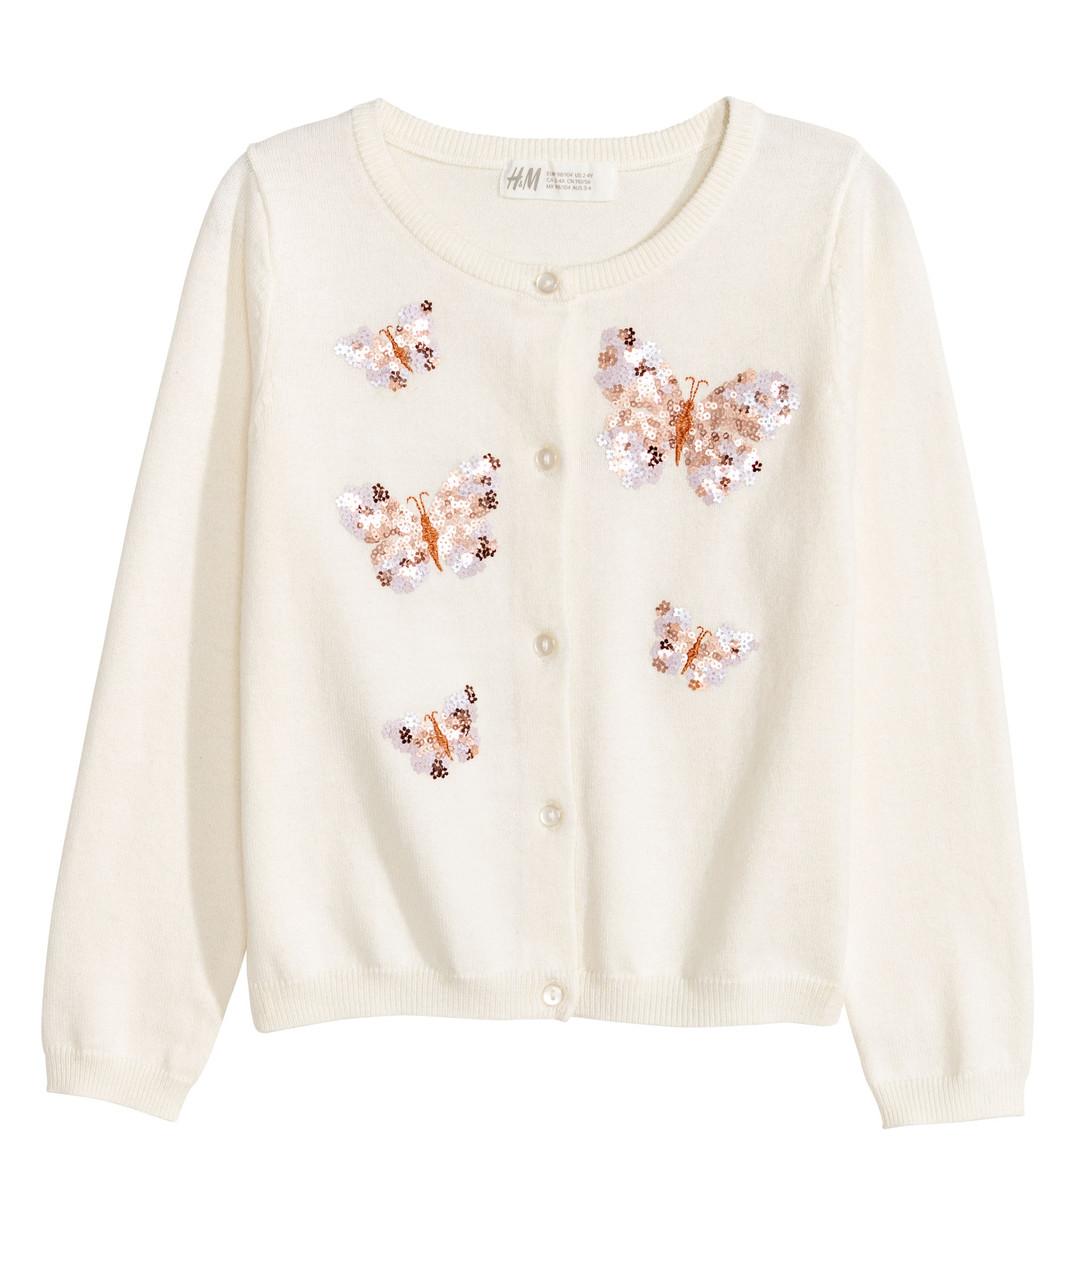 Кардиган с пайетками для девочки H&M Швеция Размер 134-140